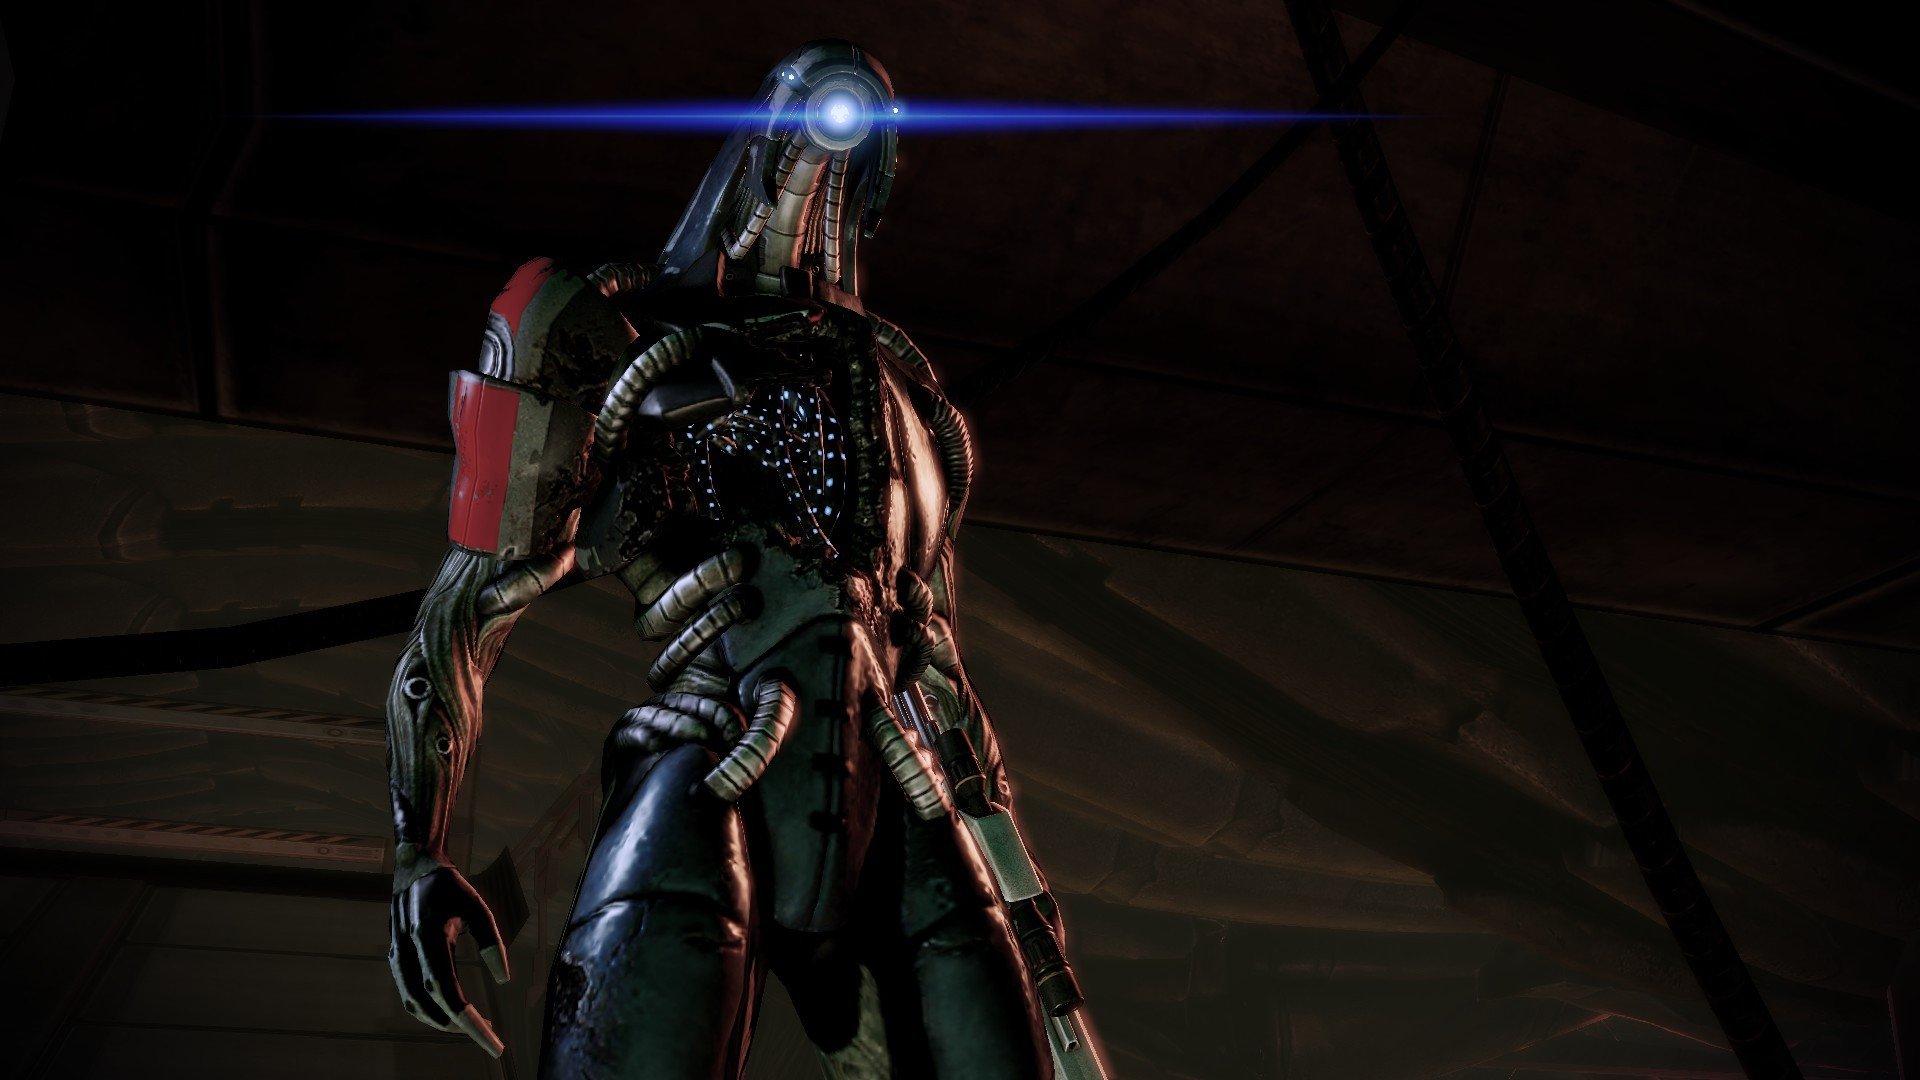 Legion (Mass Effect) wallpapers HD for desktop backgrounds